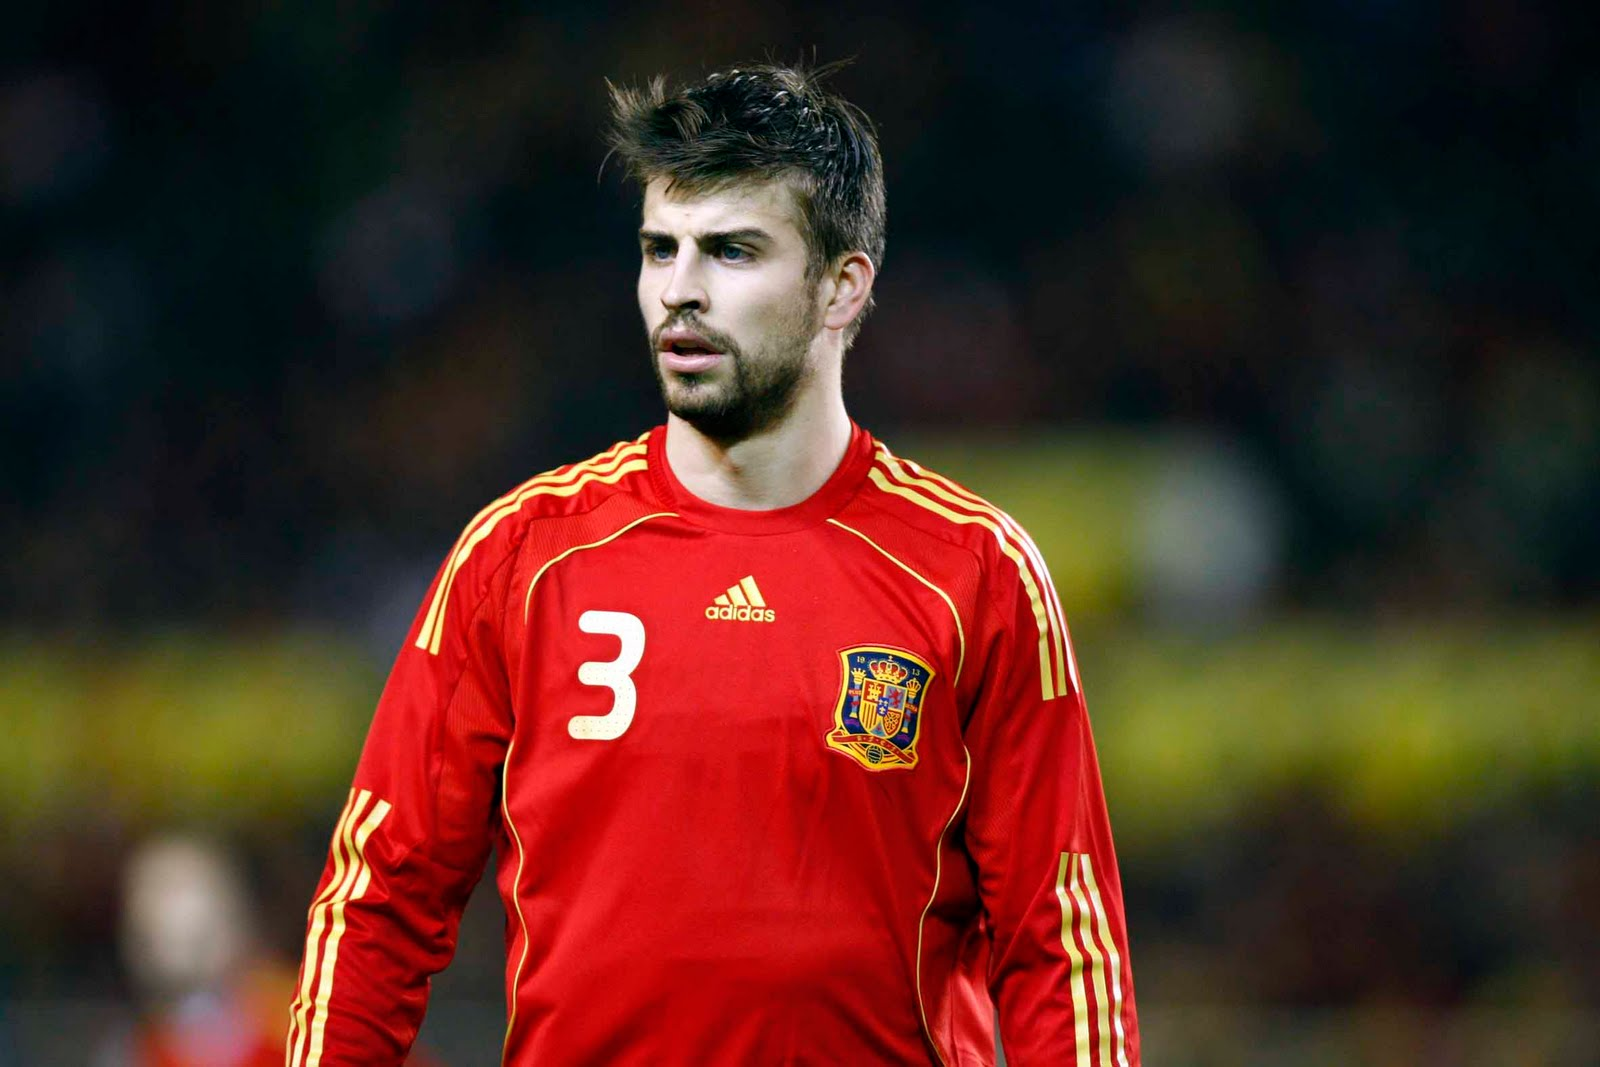 http://1.bp.blogspot.com/_J3_liDBfbvs/TPmn5yUKJmI/AAAAAAAA0Bc/Xd9WrfOs8QY/s1600/Gerard+Pique+Spain+Football+Player.jpg